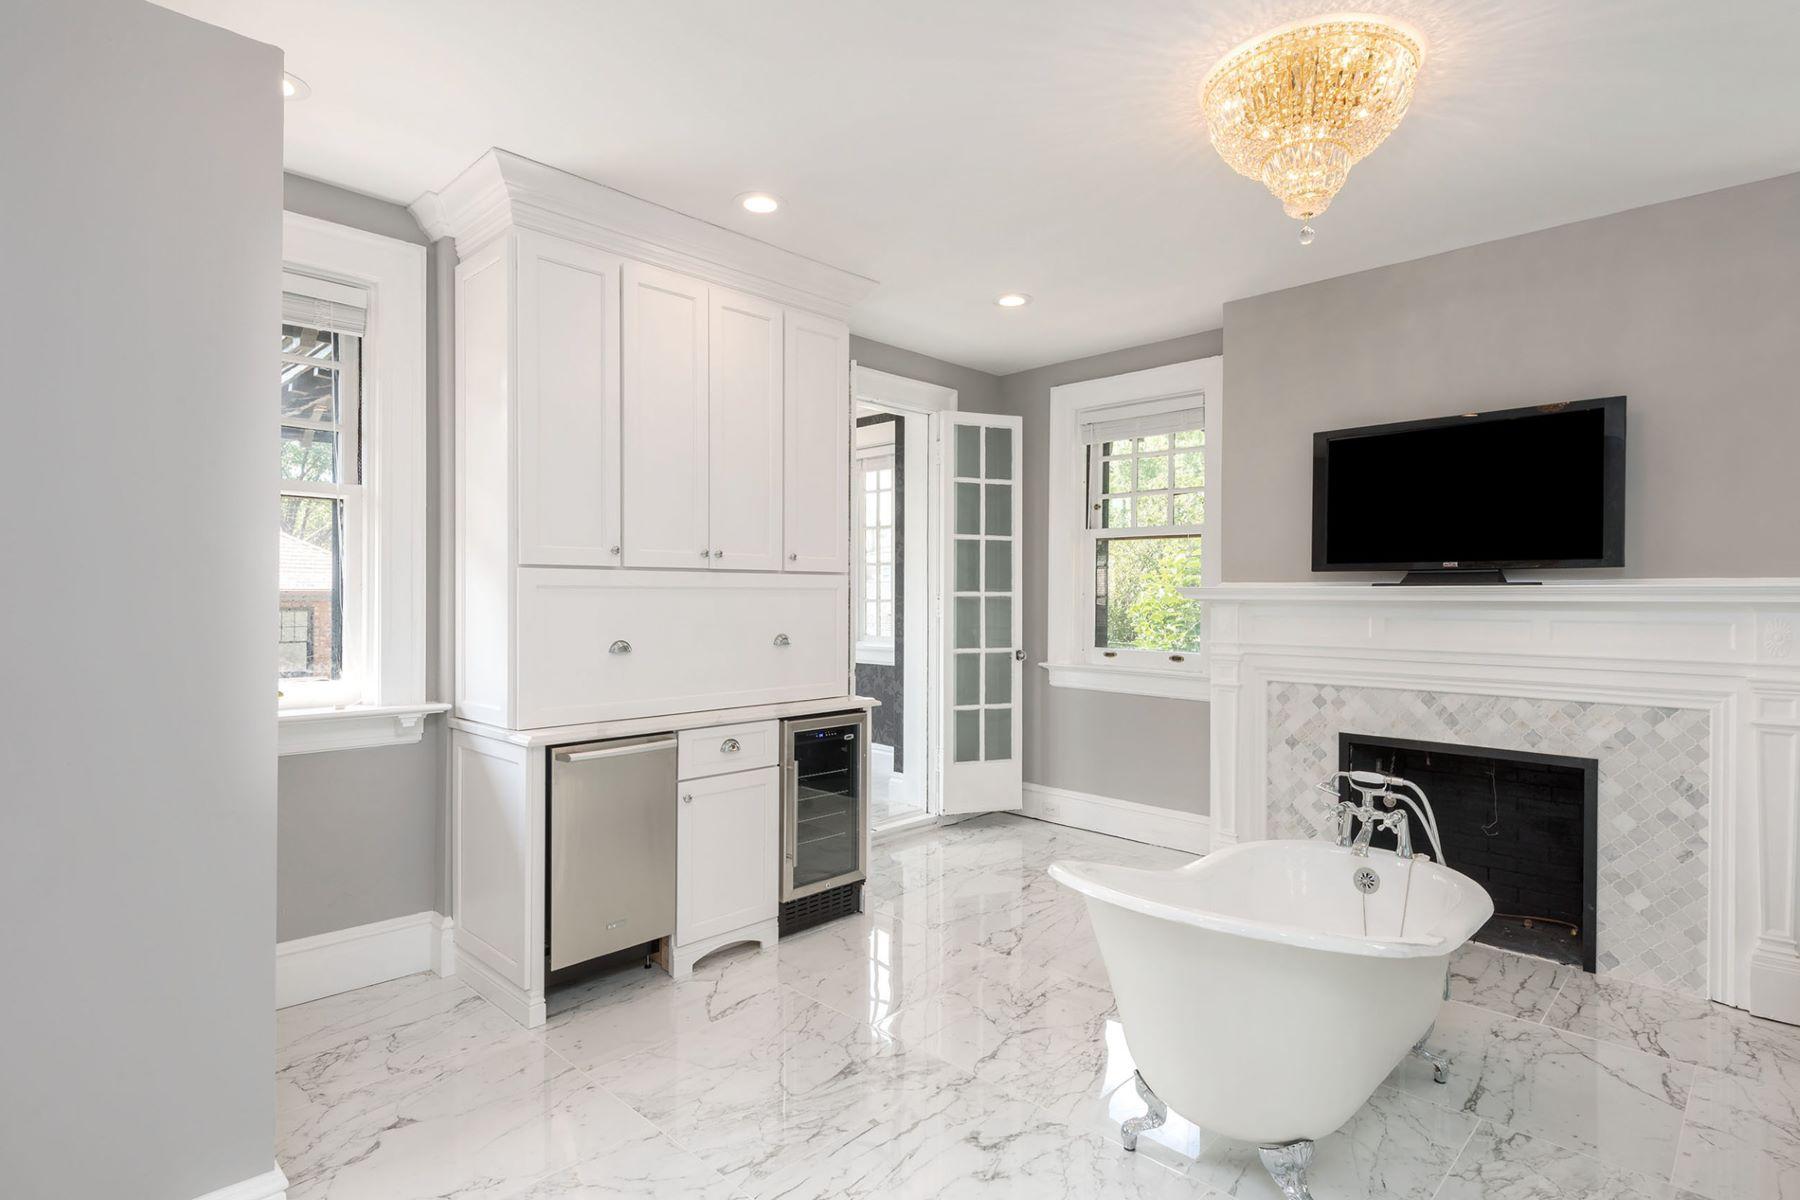 Additional photo for property listing at Washington Terr 12 Washington Terrace St. Louis, Missouri 63112 United States